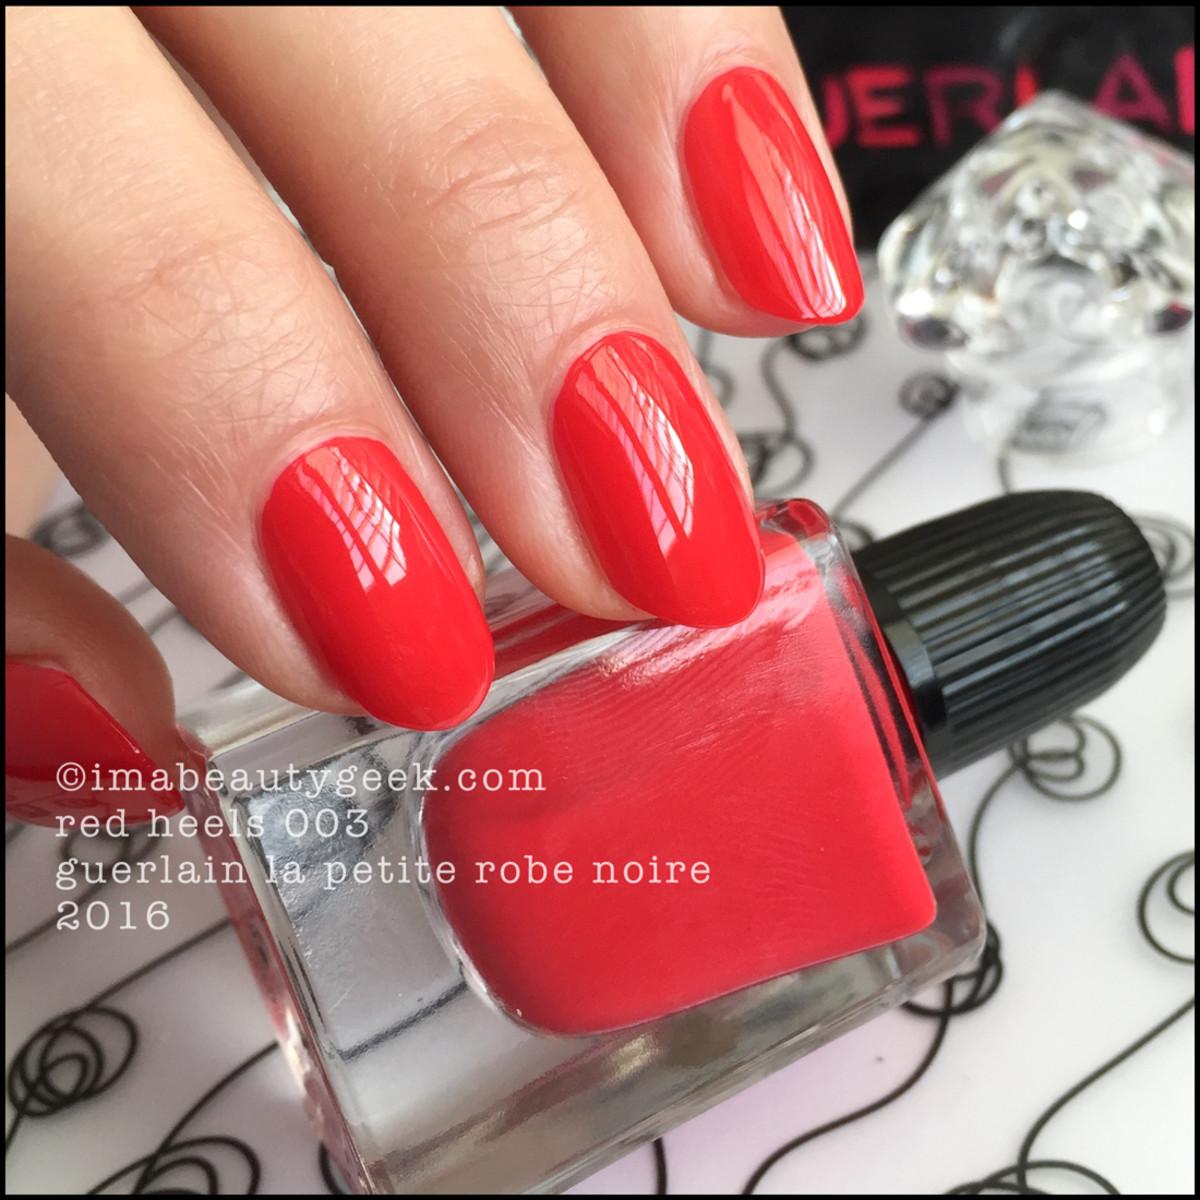 Guerlain Red Heels 003_Guerlain La Petite Robe Noire 2016